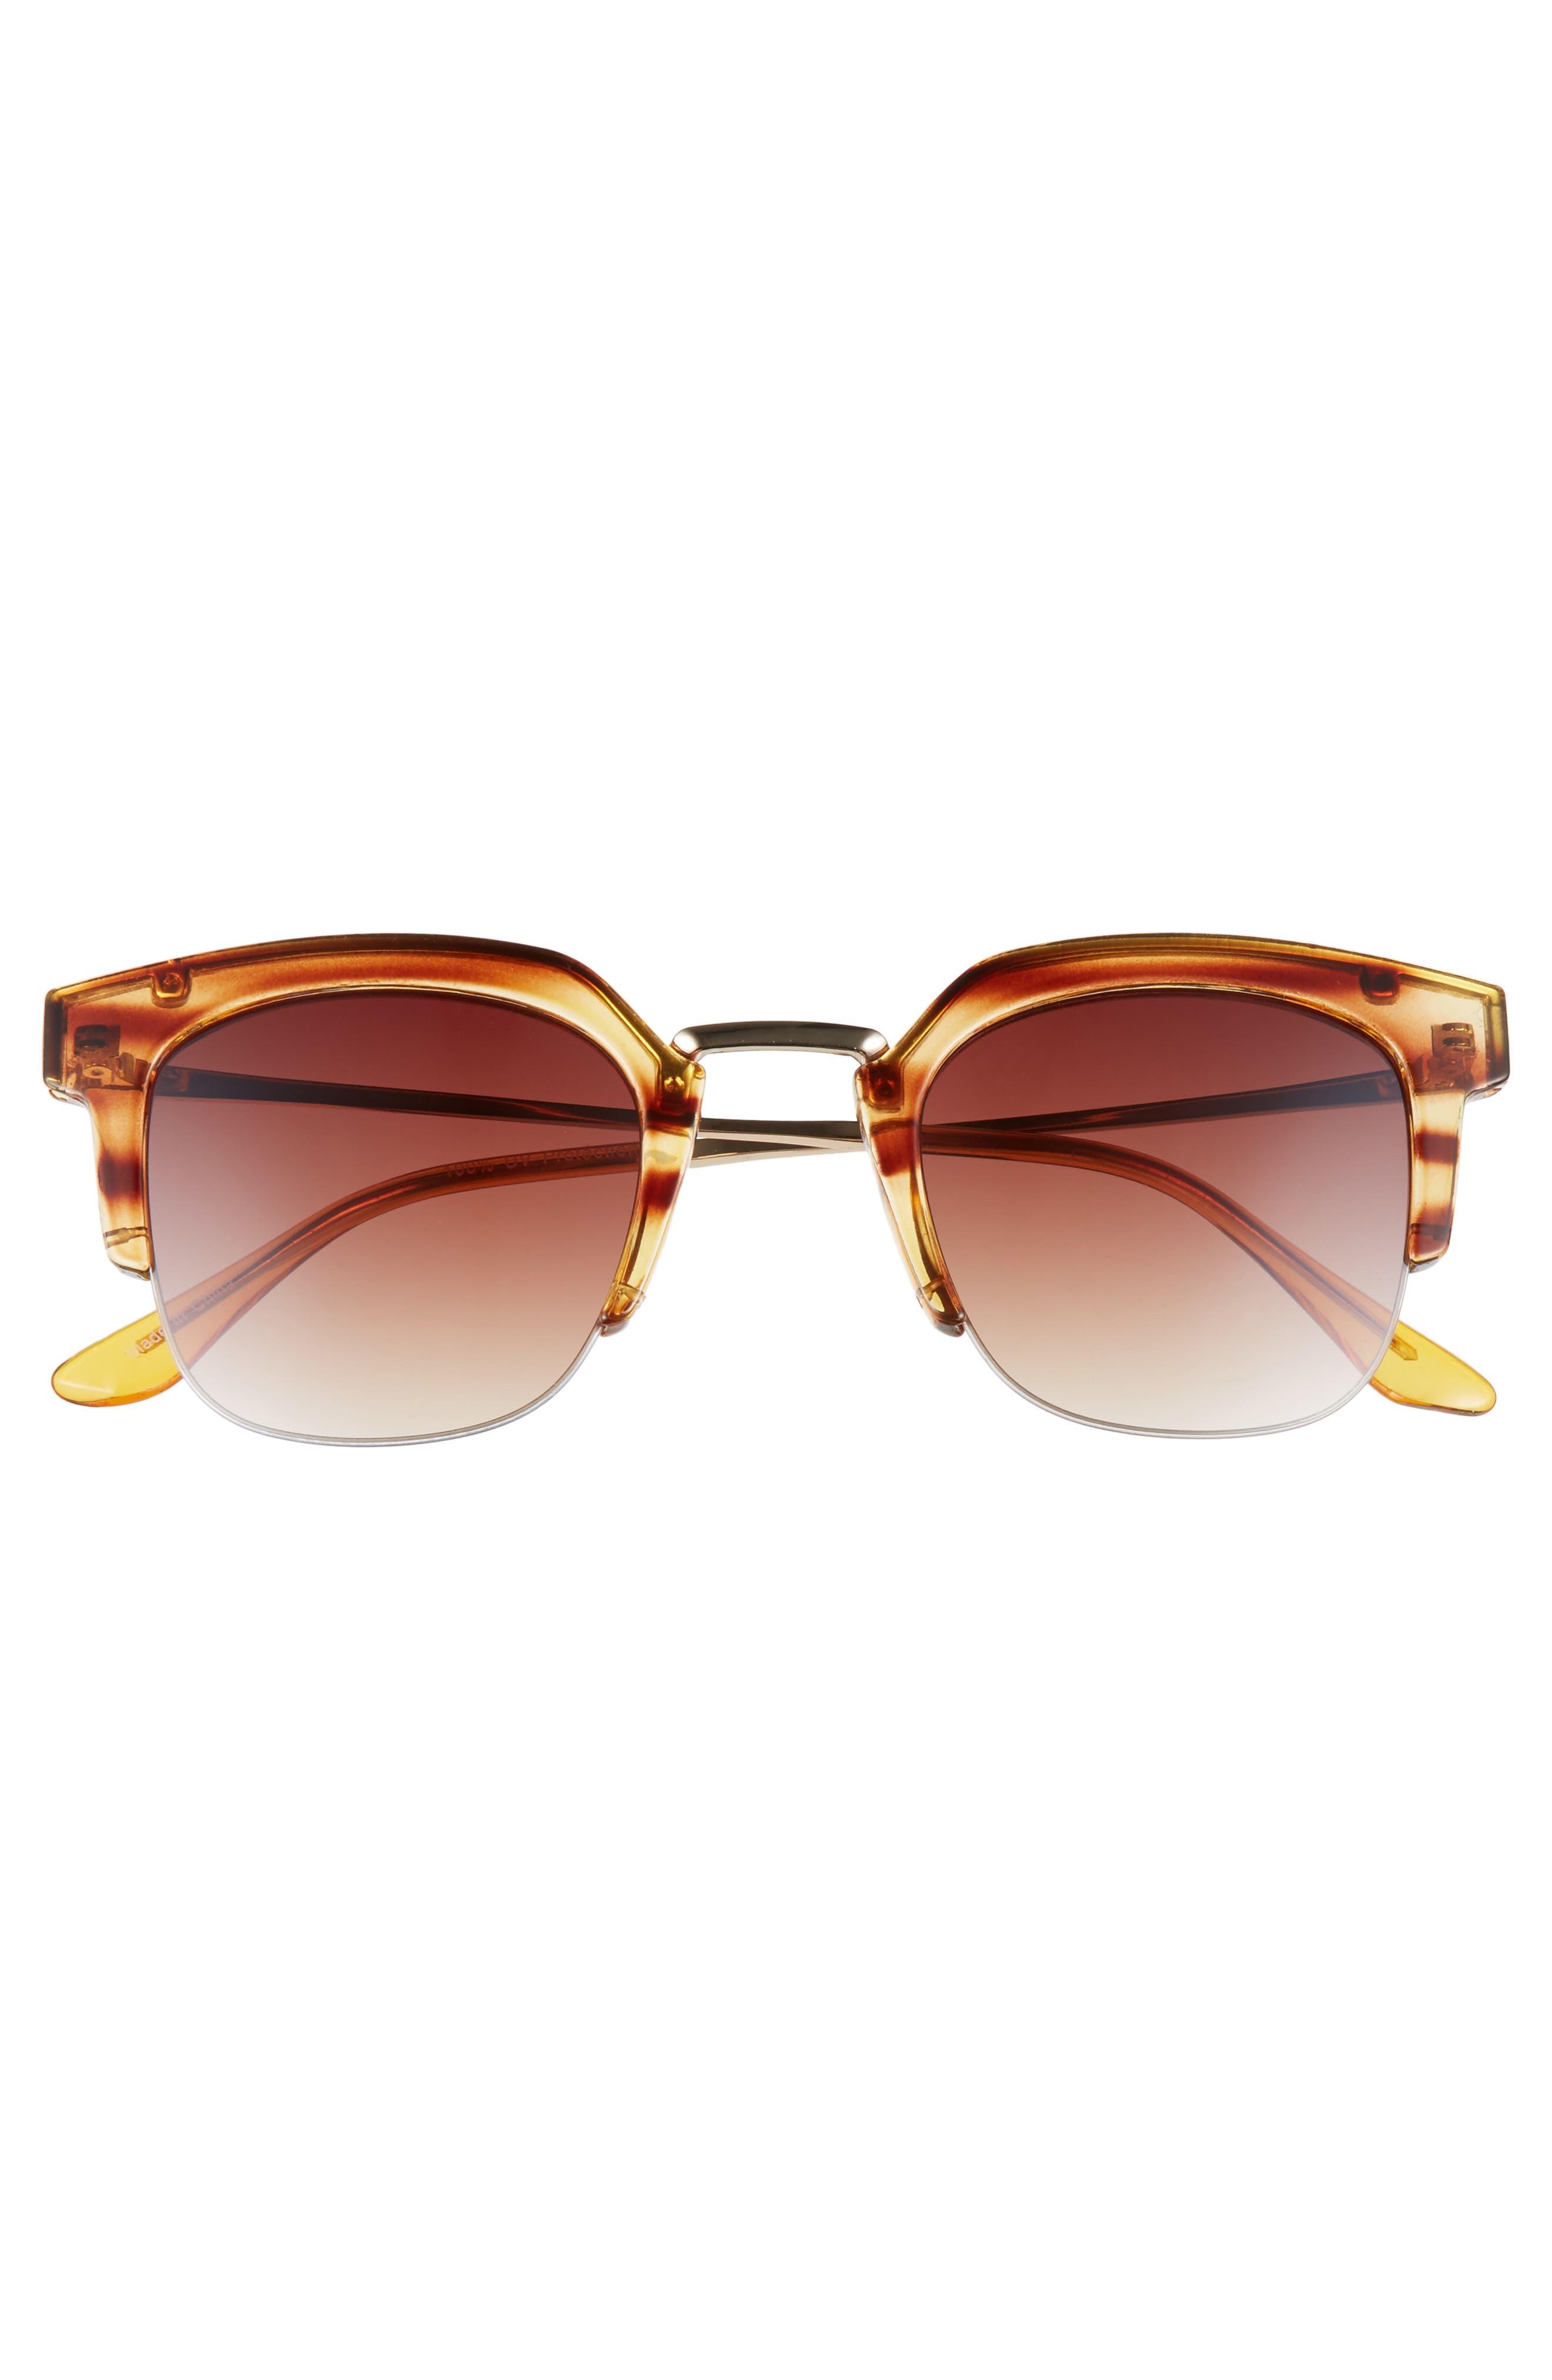 47mm Retro Sunglasses,                             Alternate thumbnail 3, color,                             200